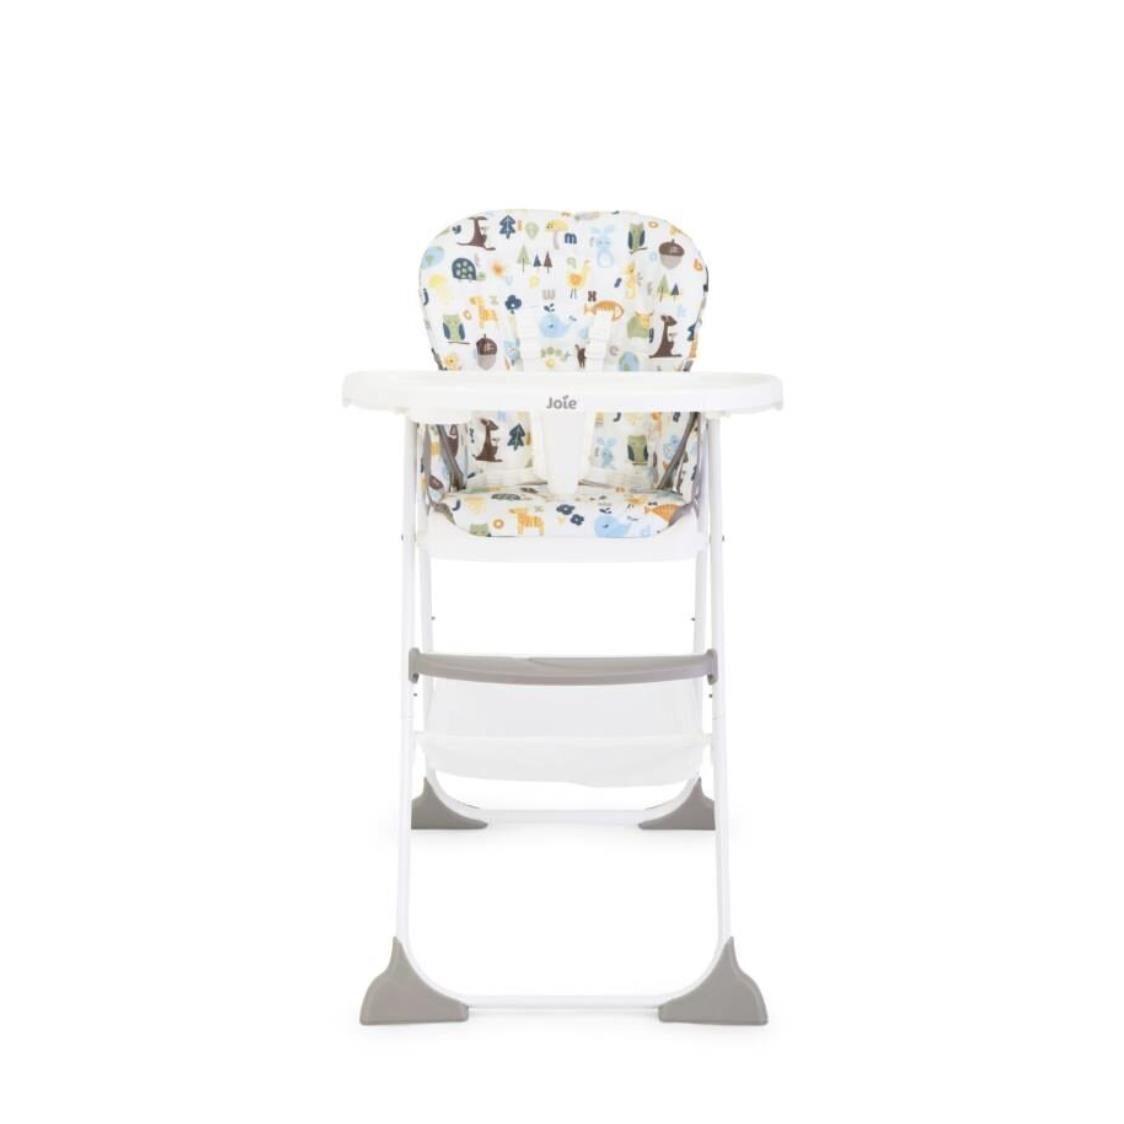 Joie Mimzy Snacker Alphabet High Chair